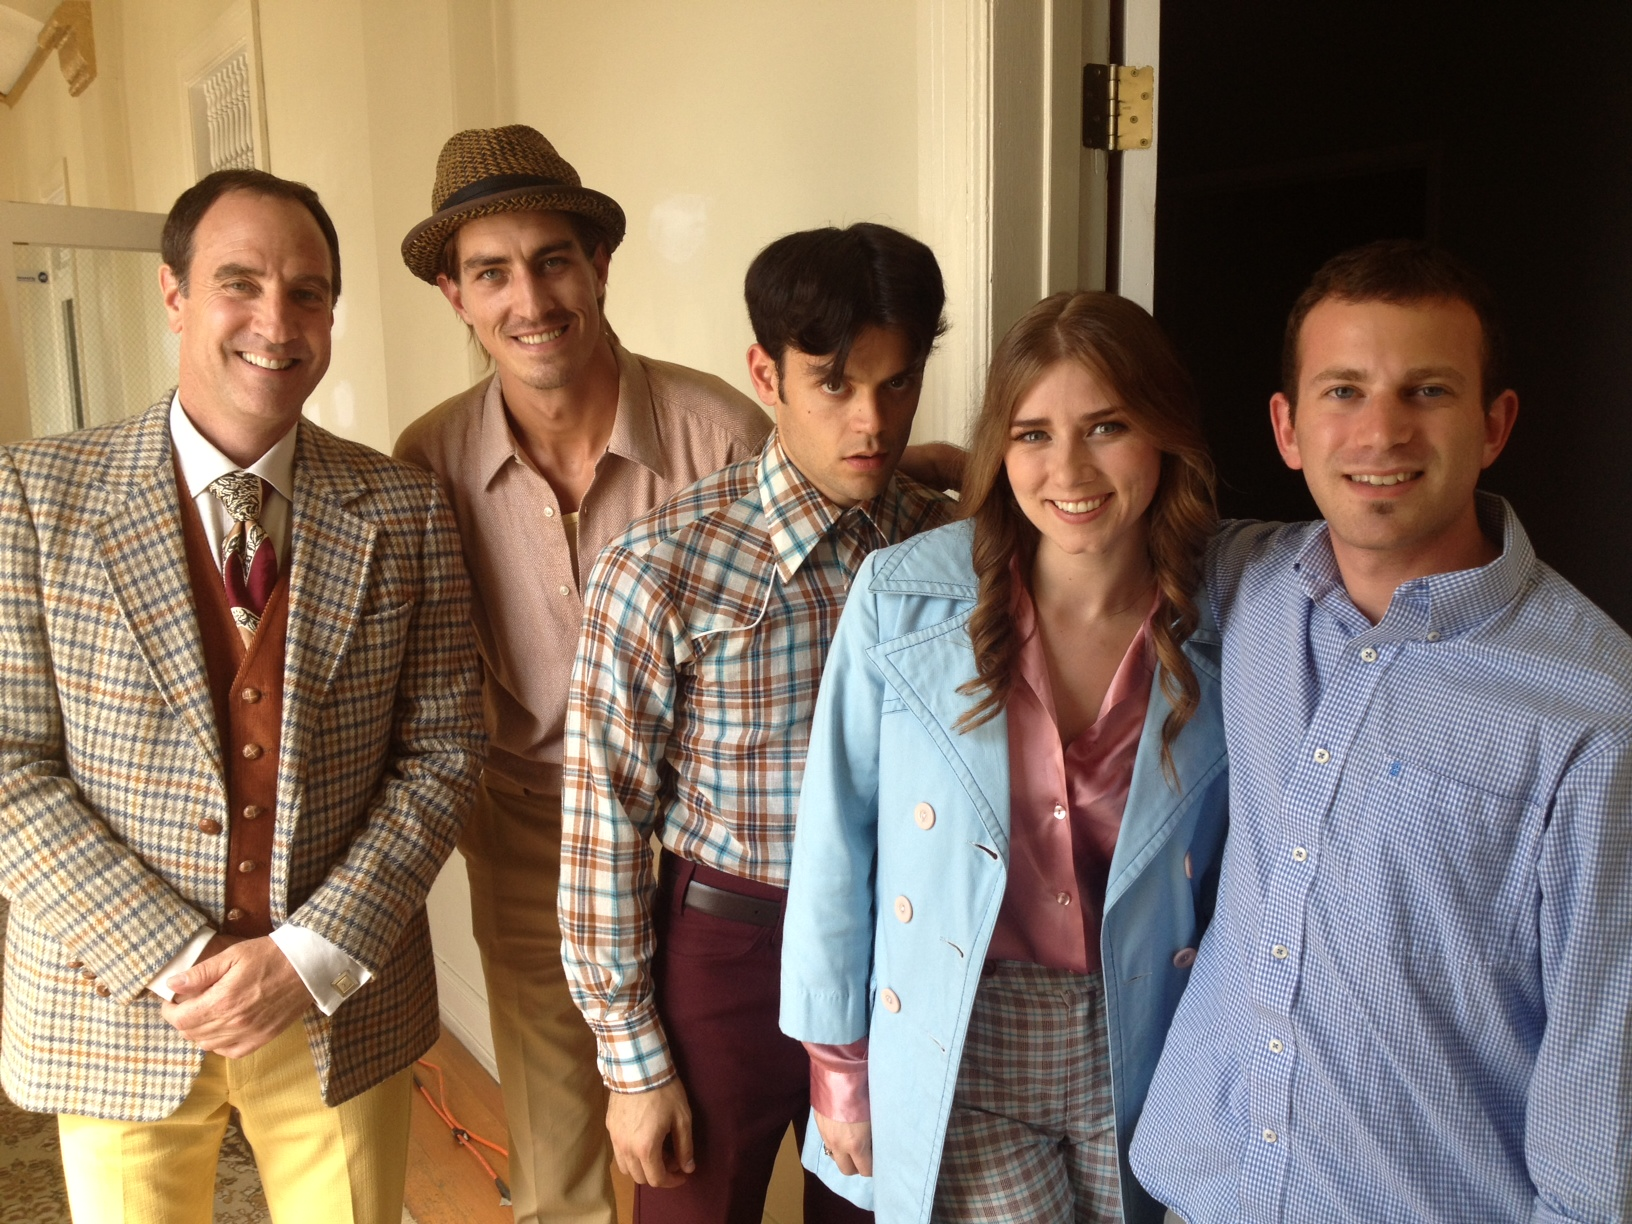 Charlie & cast